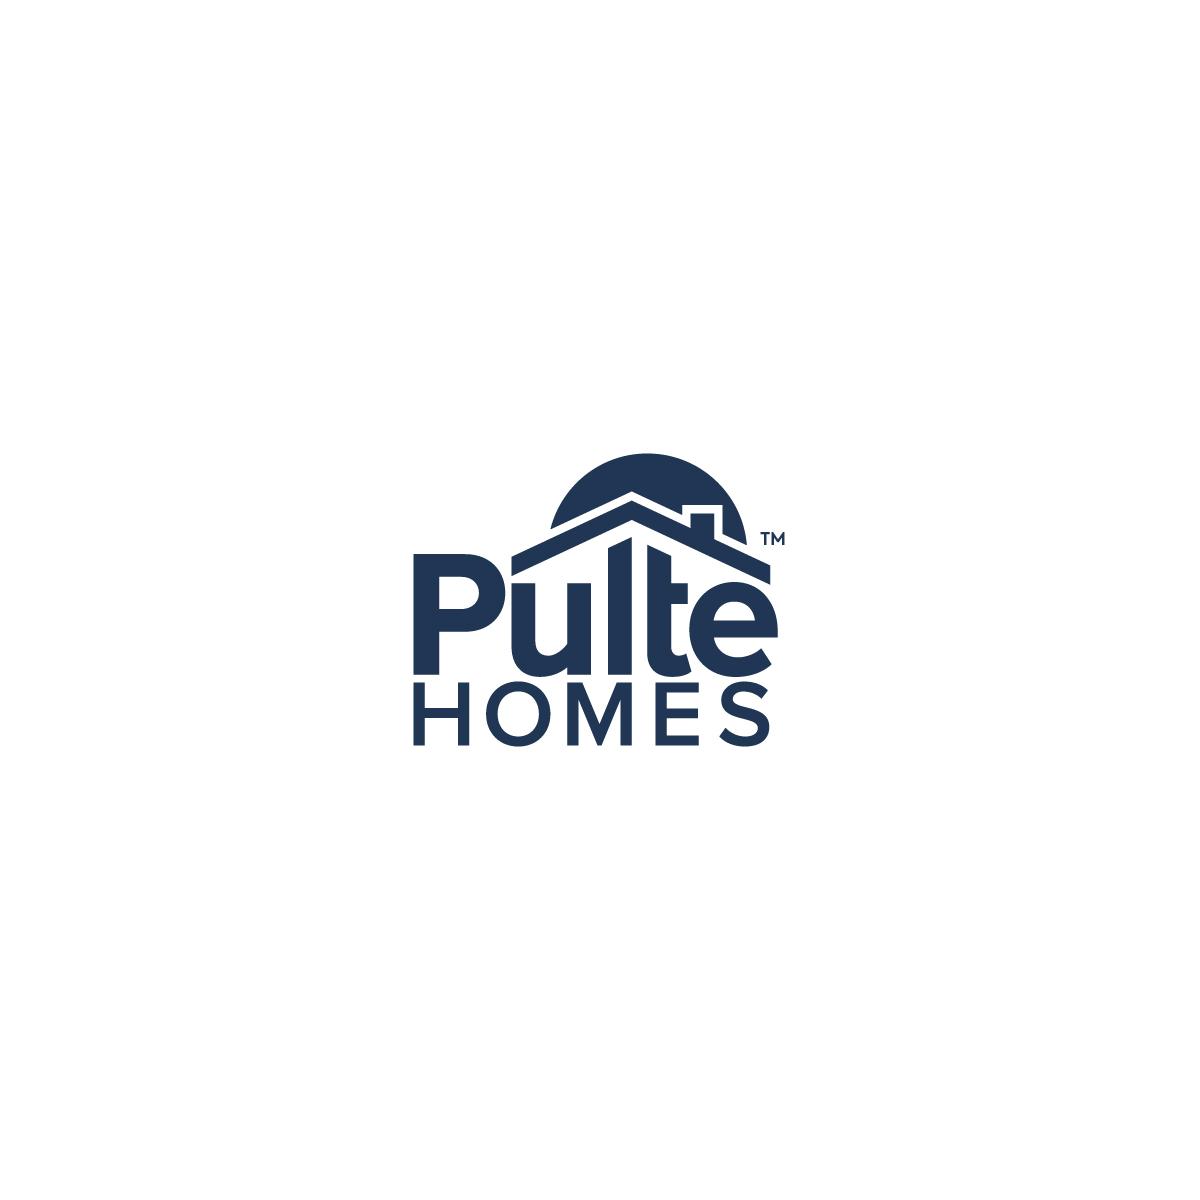 Pulte Homes Company Logo